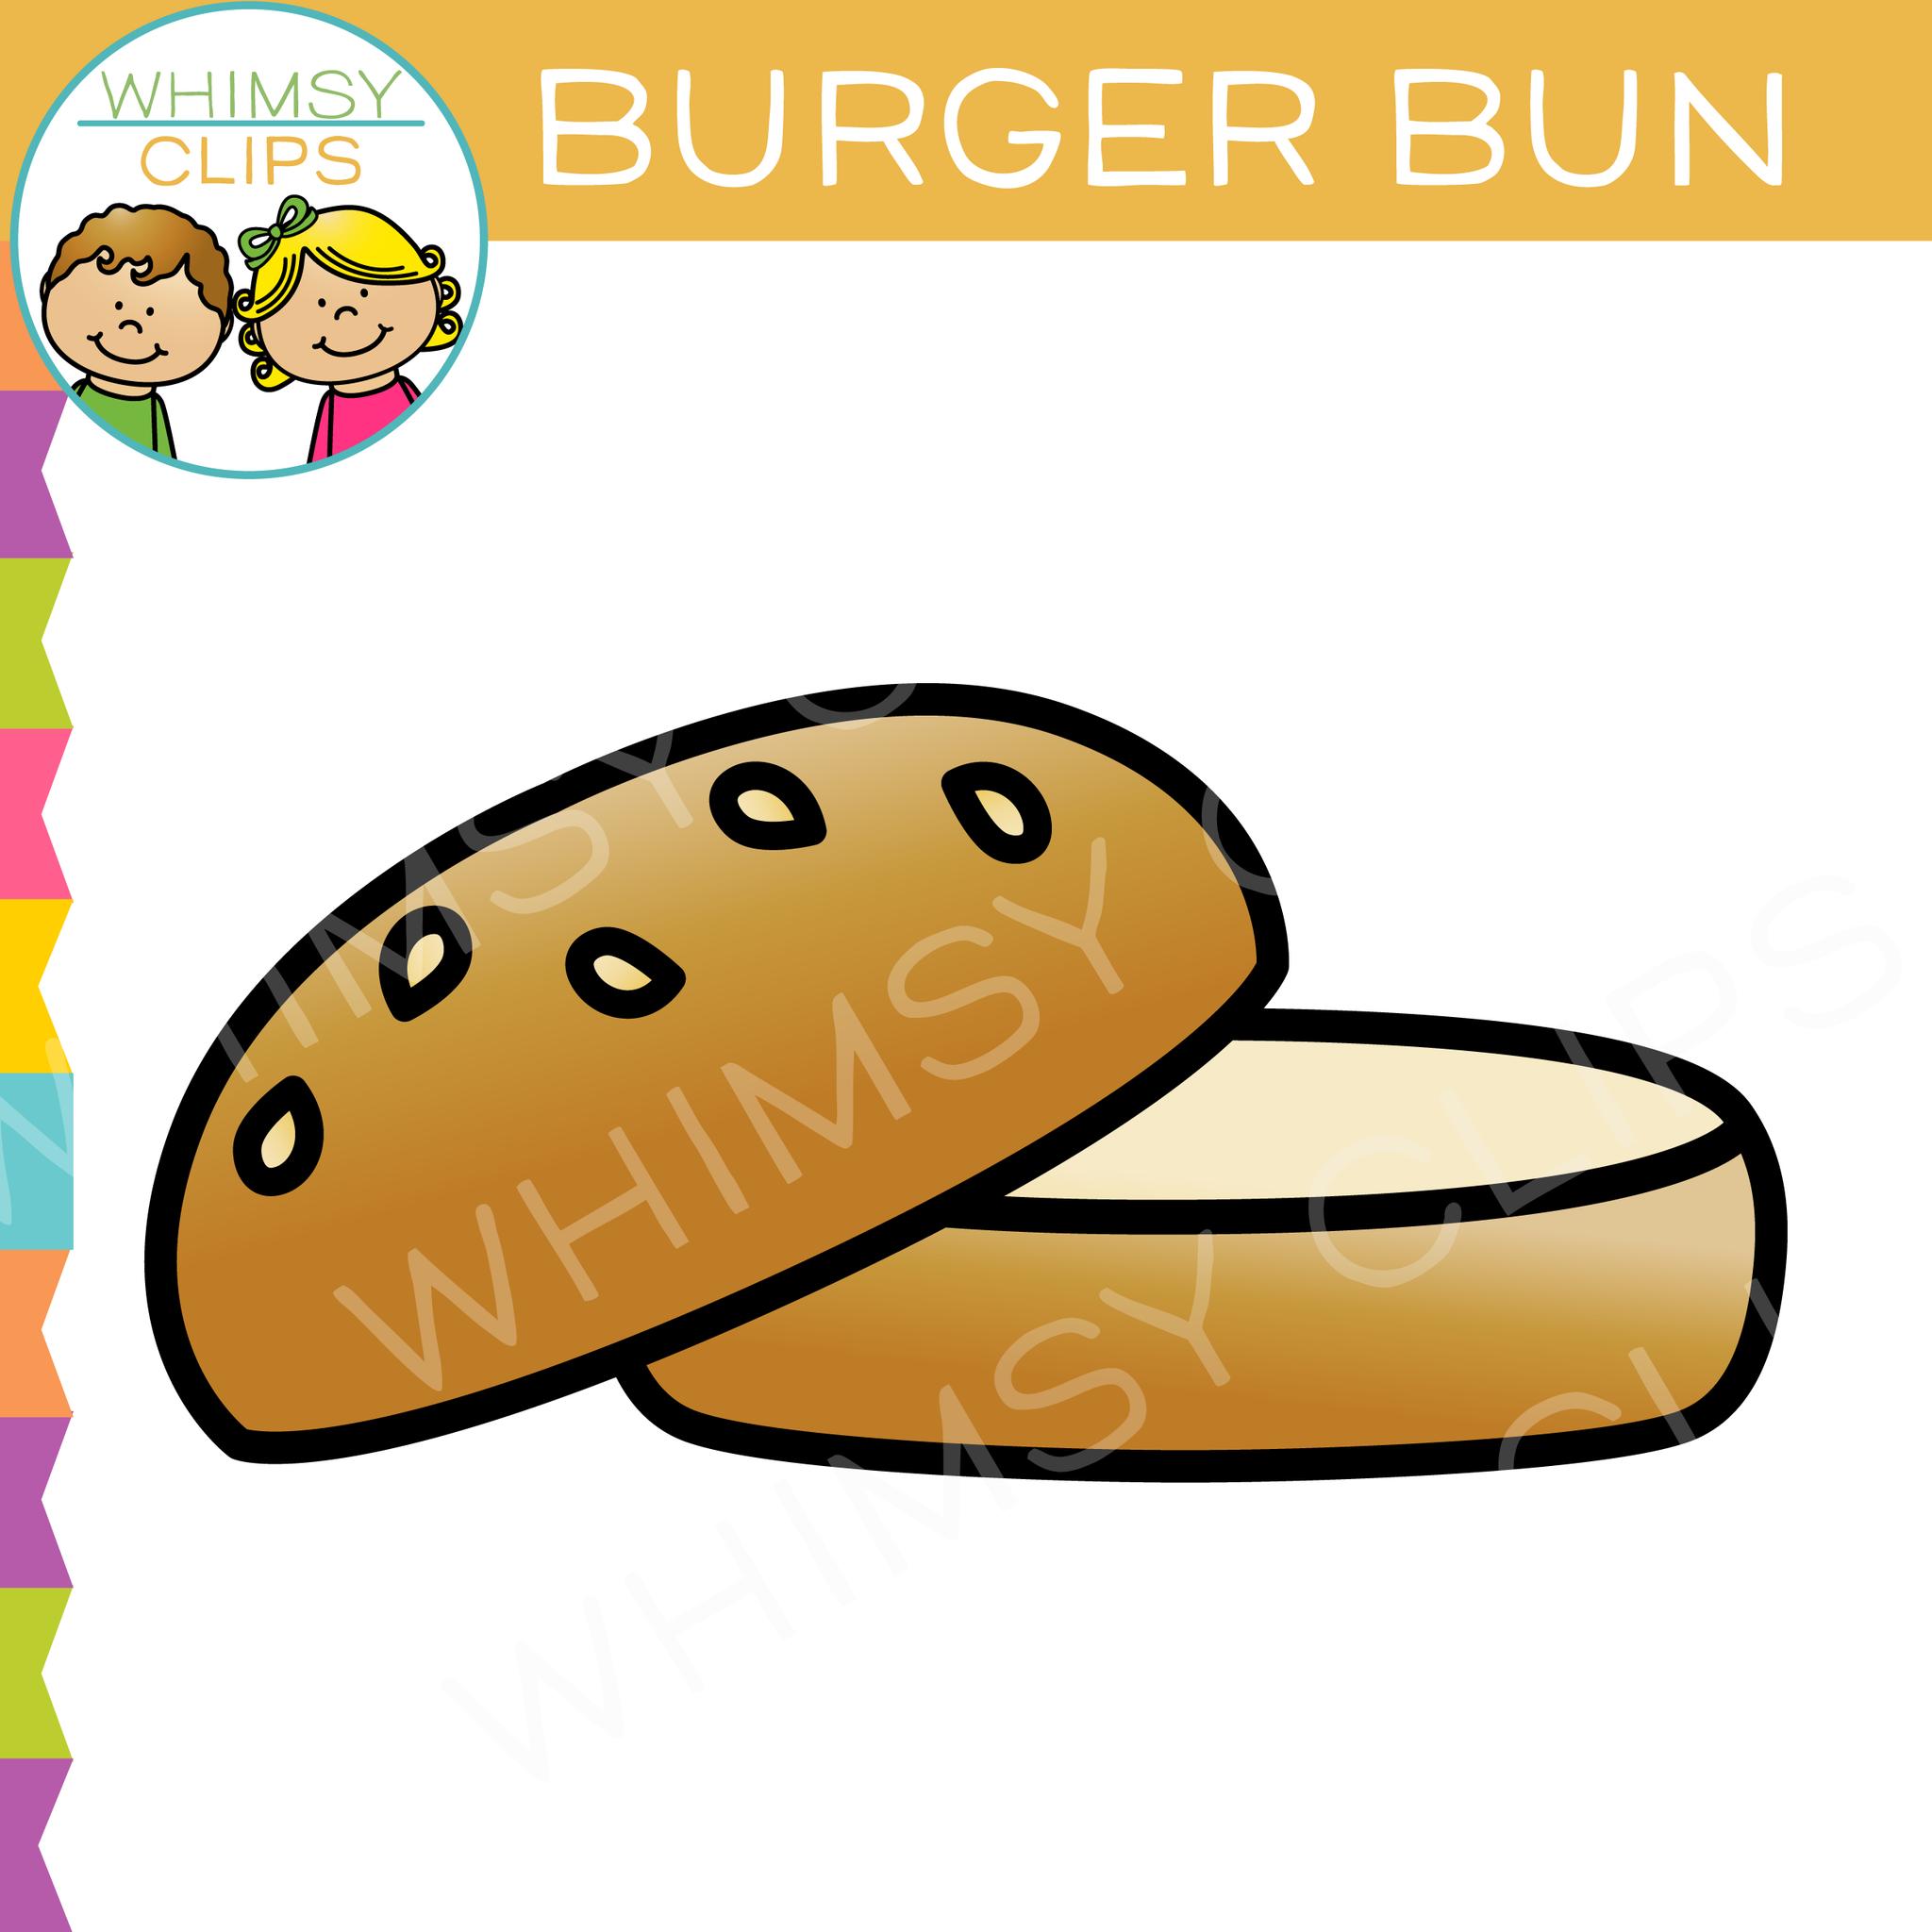 Bun clipart jpg transparent download Burger Bun Clip Art jpg transparent download